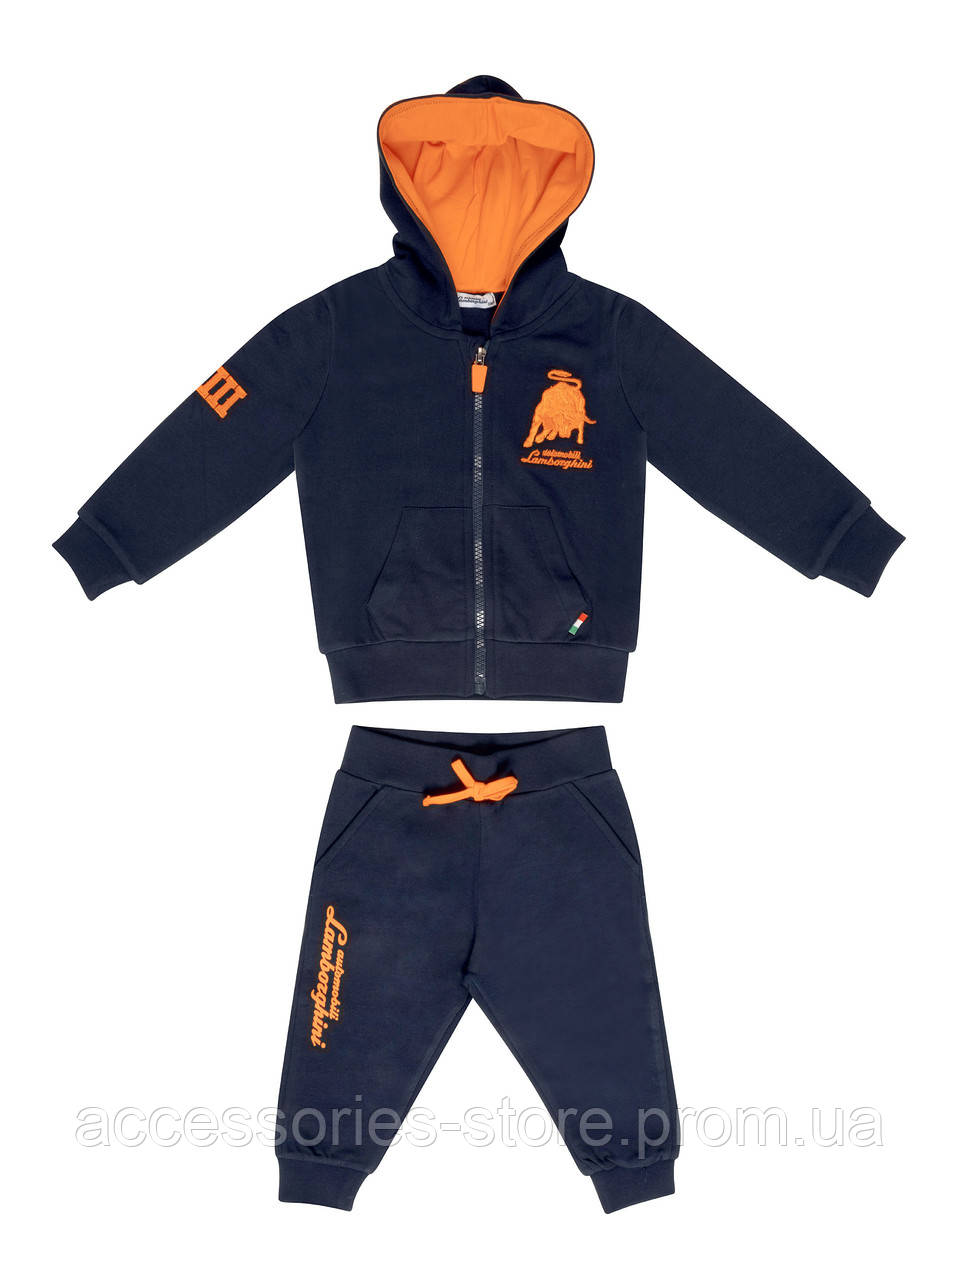 Детский костюм Baby Lamborghini Bull LXIII outfit